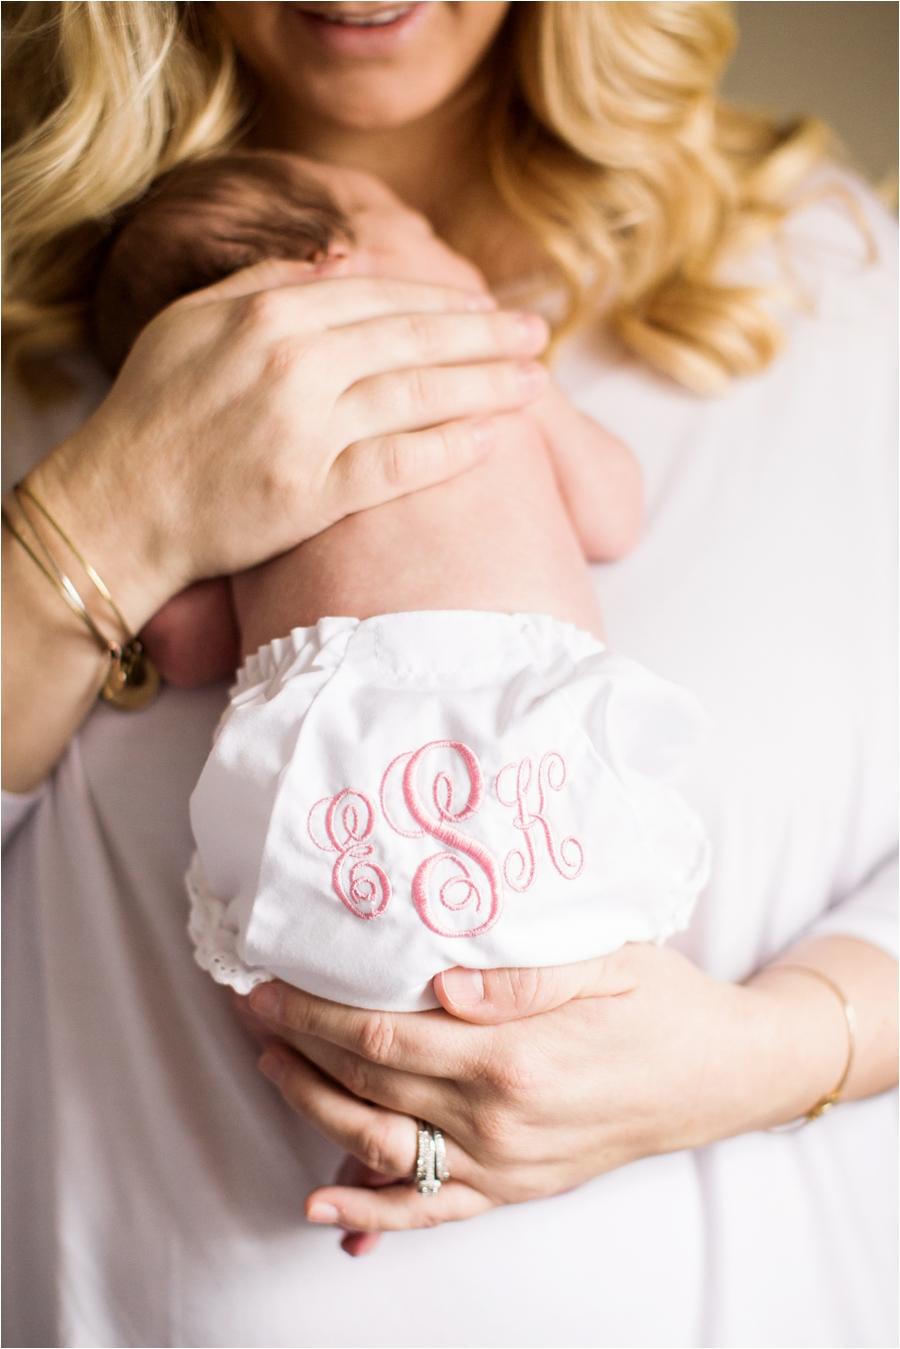 harrisonburg newborn photos by charlottesville newborn and family photographer, amy nicole photography_0035